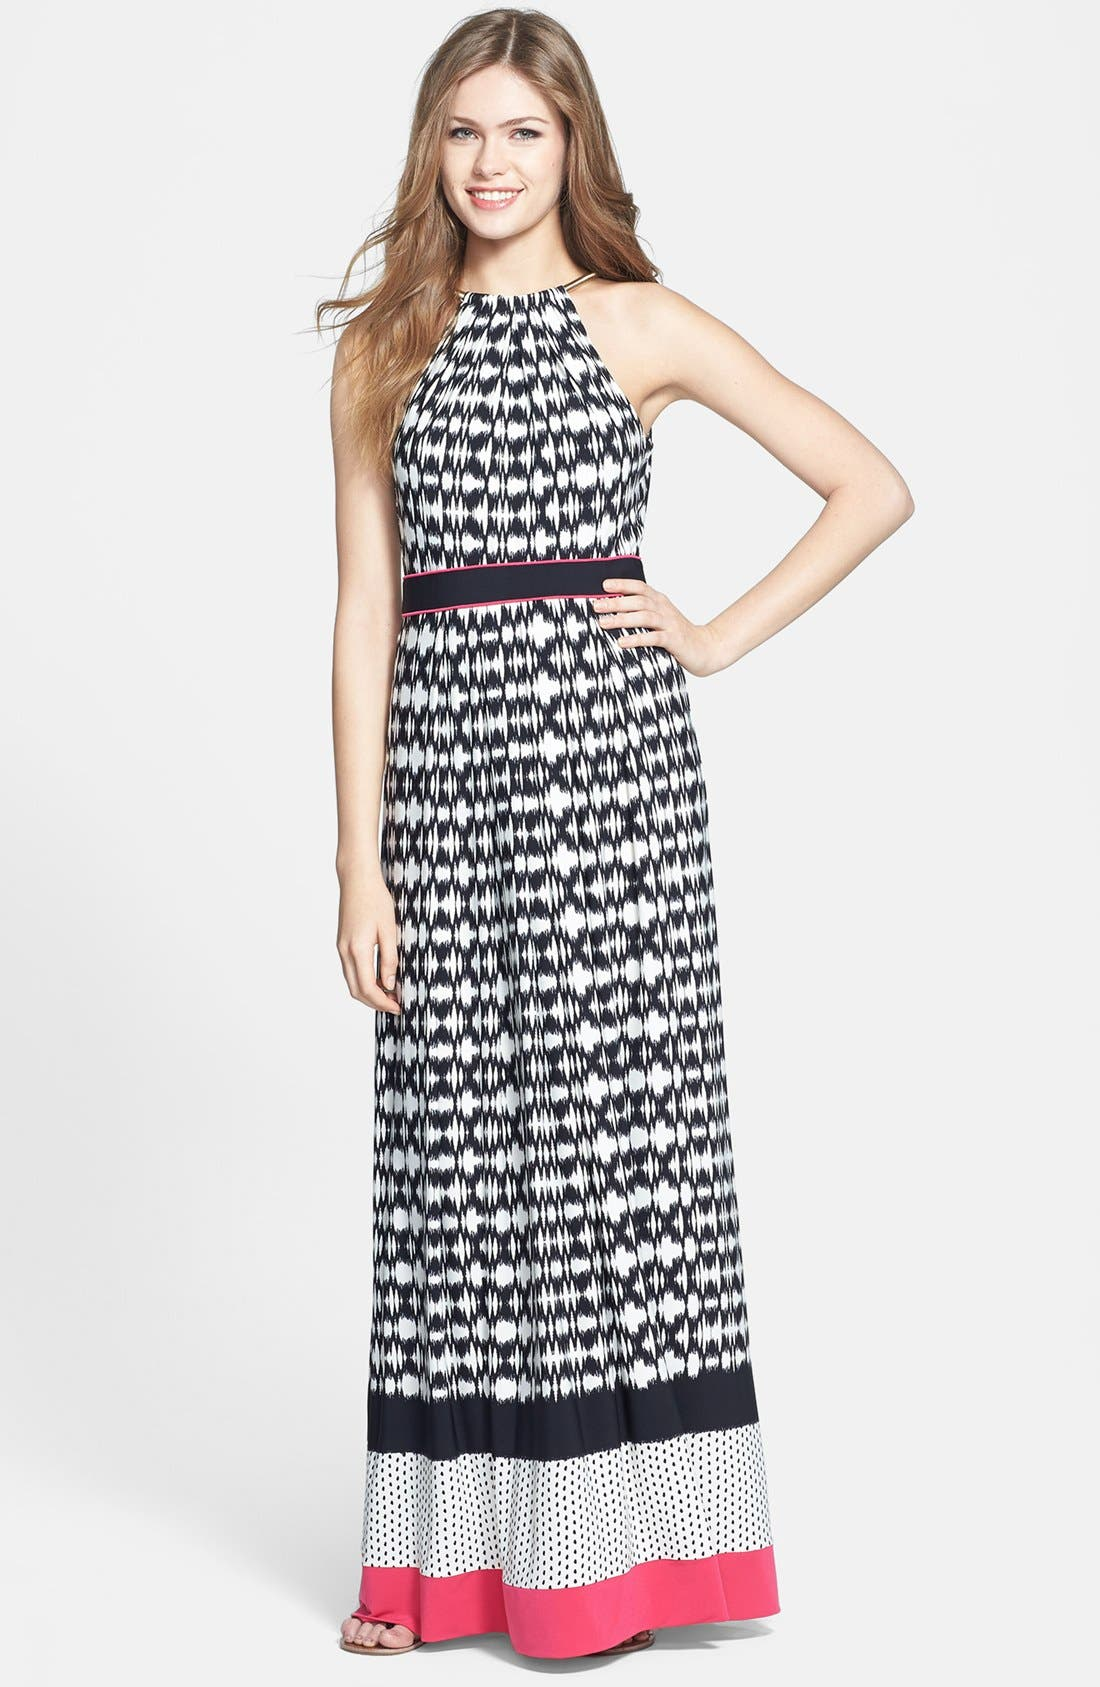 Alternate Image 1 Selected - Eliza J Metallic Neckline Sleeveless Maxi Dress